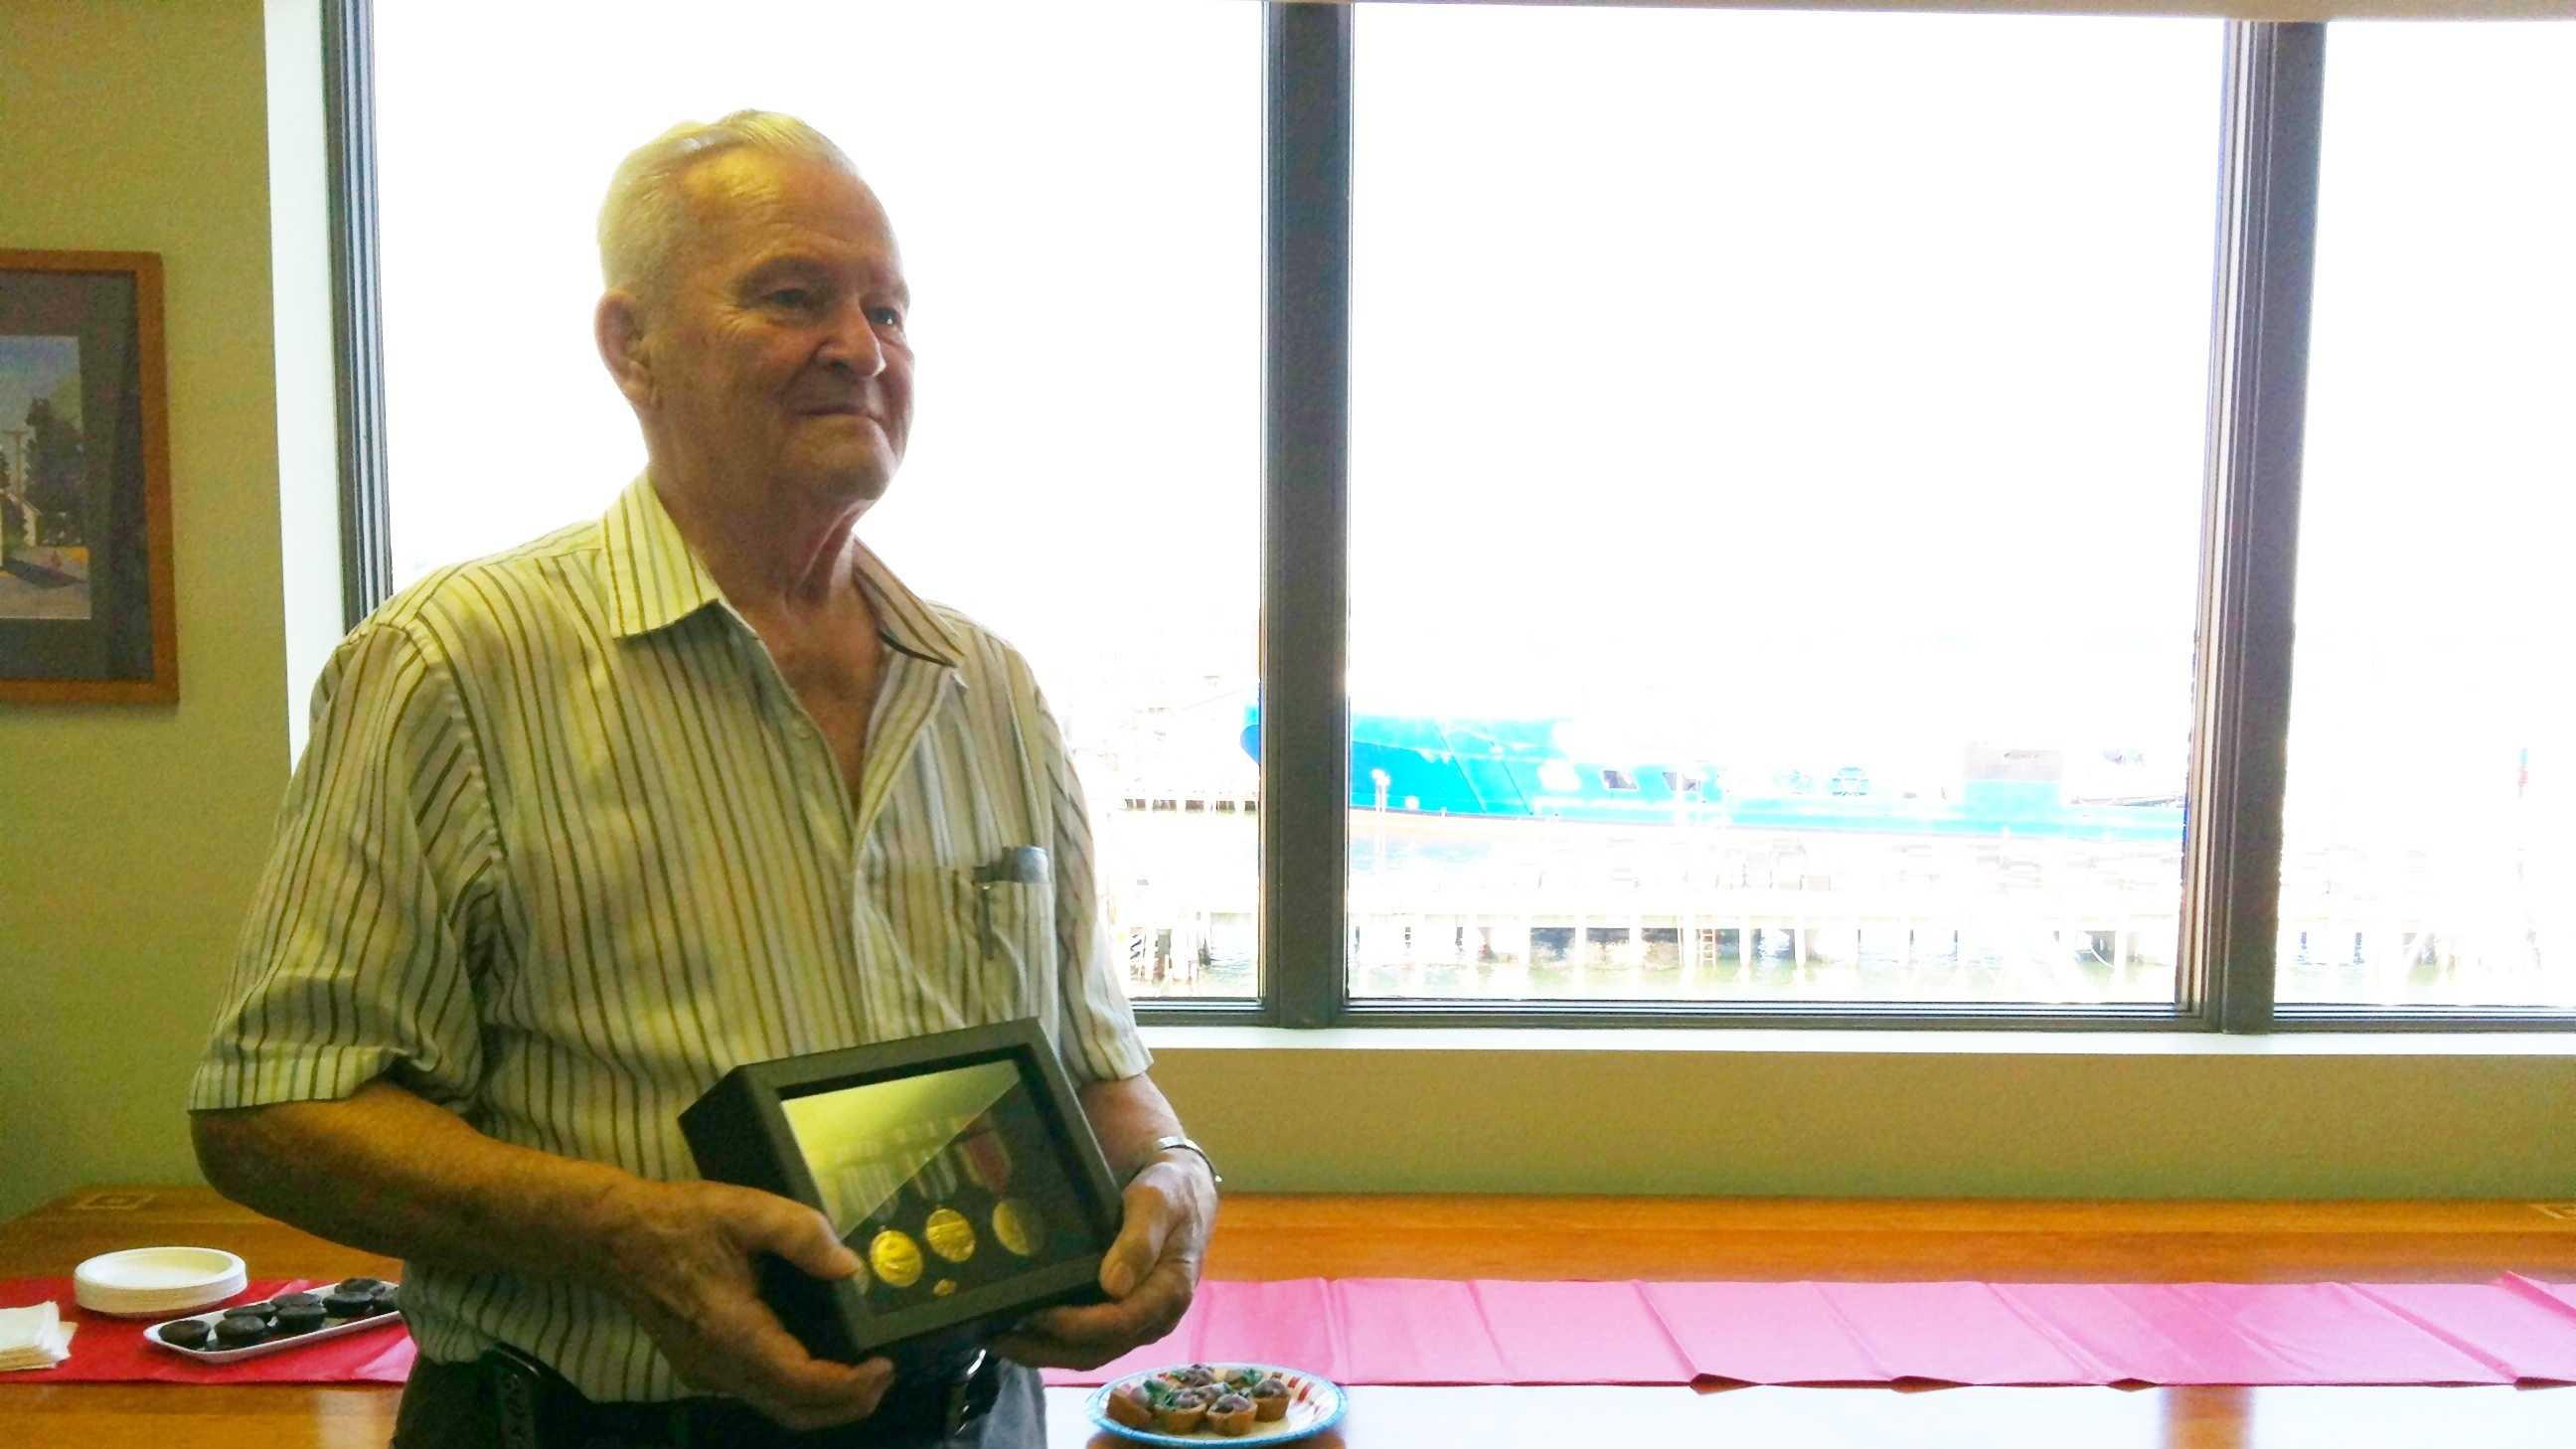 Veteran gets medals